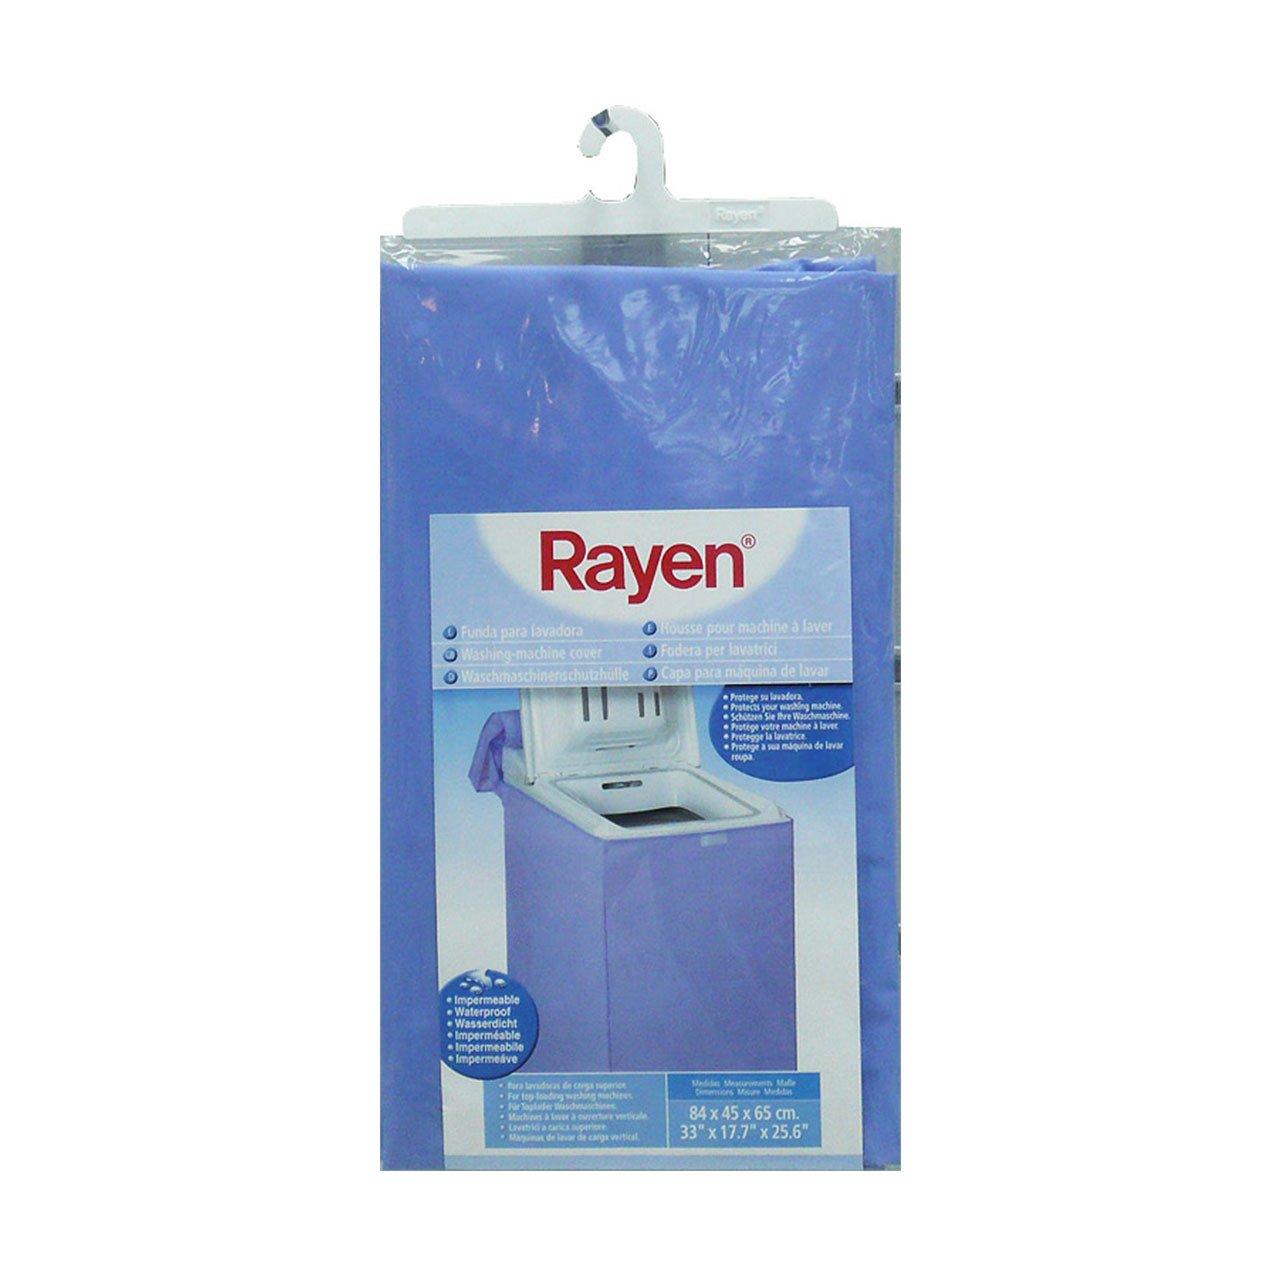 Rayen 2397 - Funda para lavadora, 84 x 45 x 65 cm, color lila: Amazon.es: Hogar